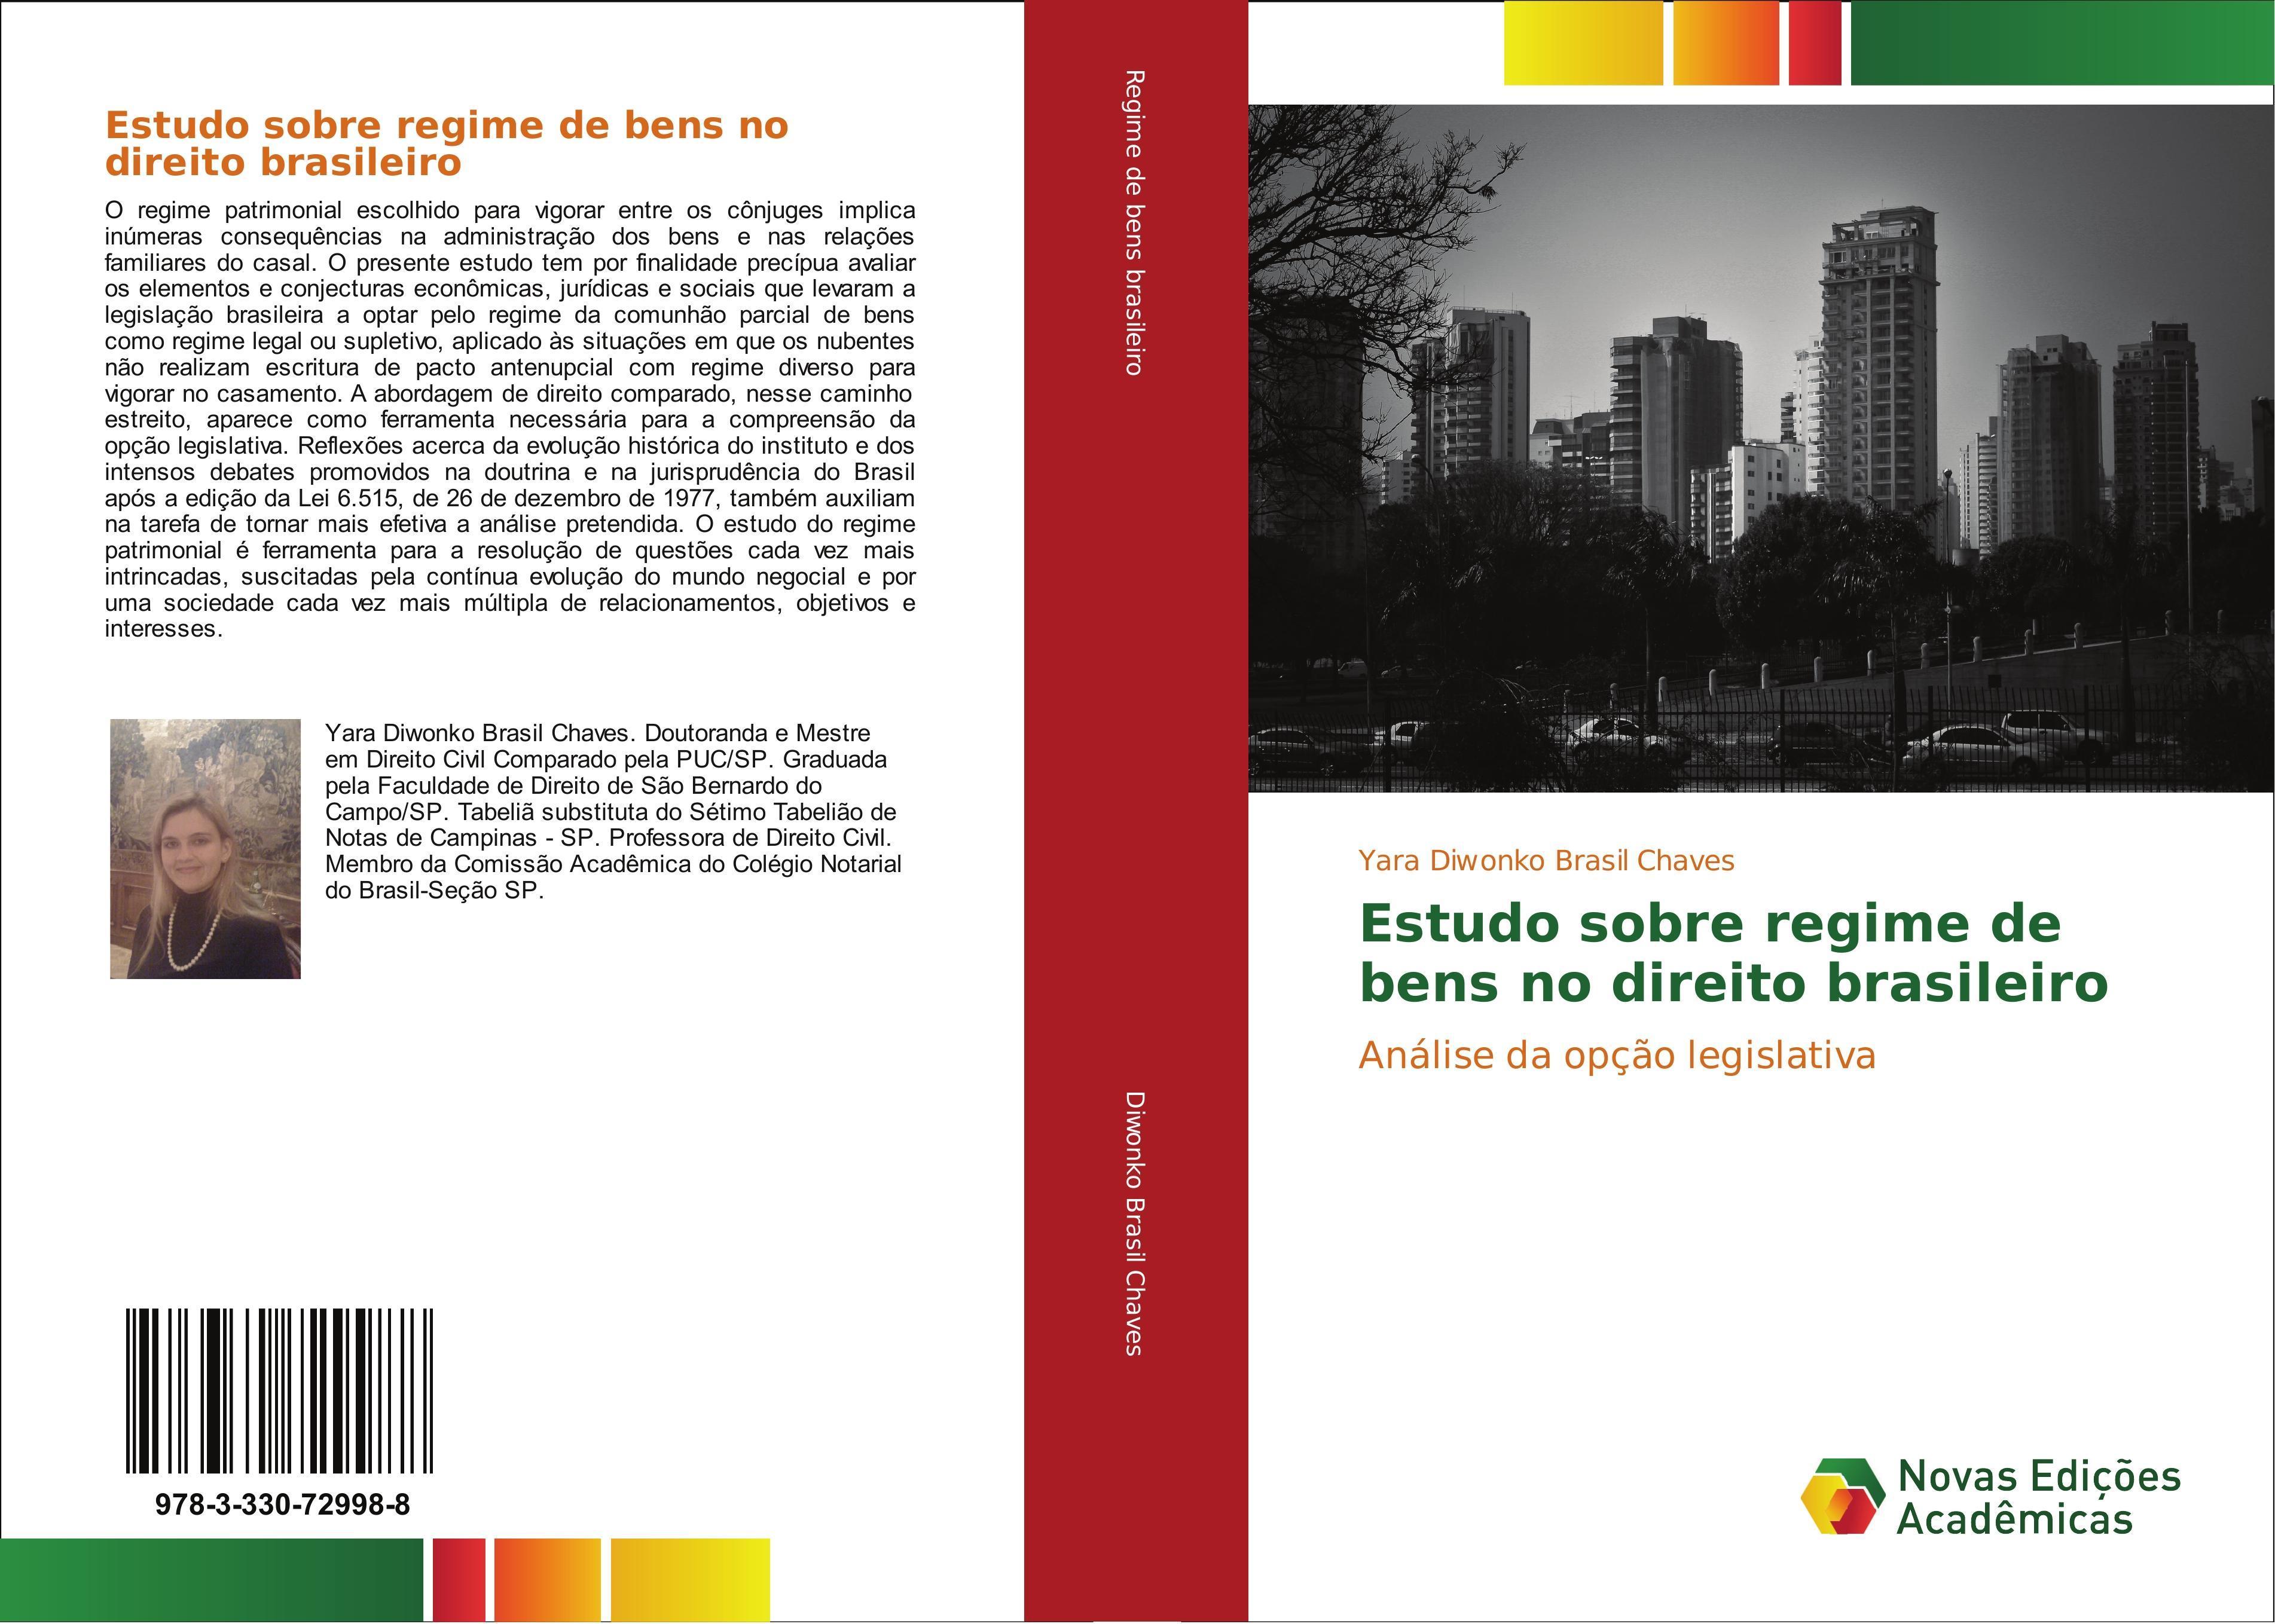 Yara Diwonko Brasil Chaves / Estudo sobre regime de bens no di ...9783330729988